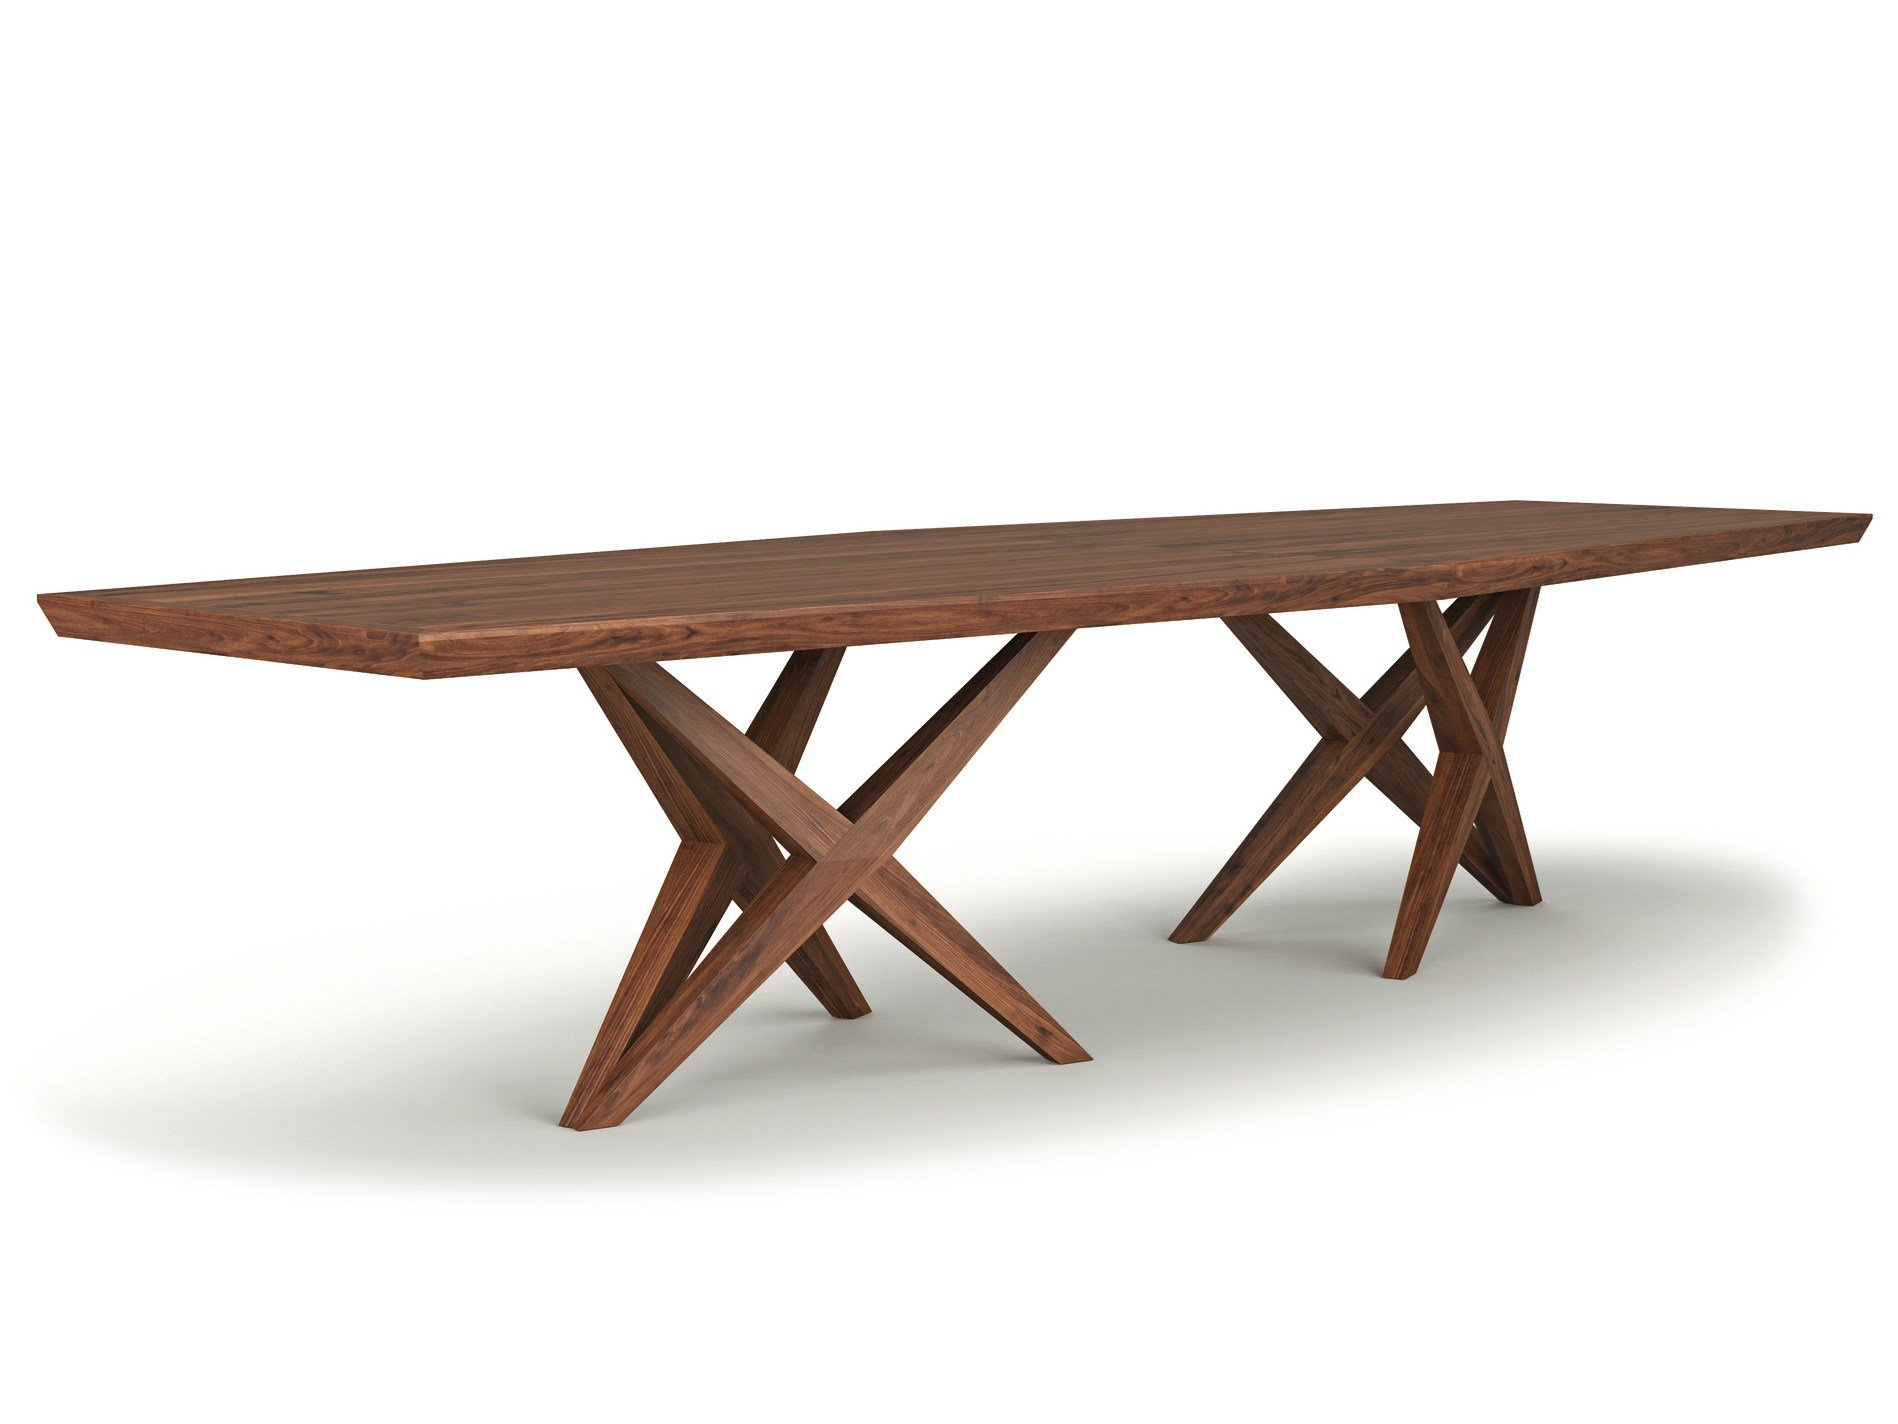 rectangular solid wood table vitox by belfakto